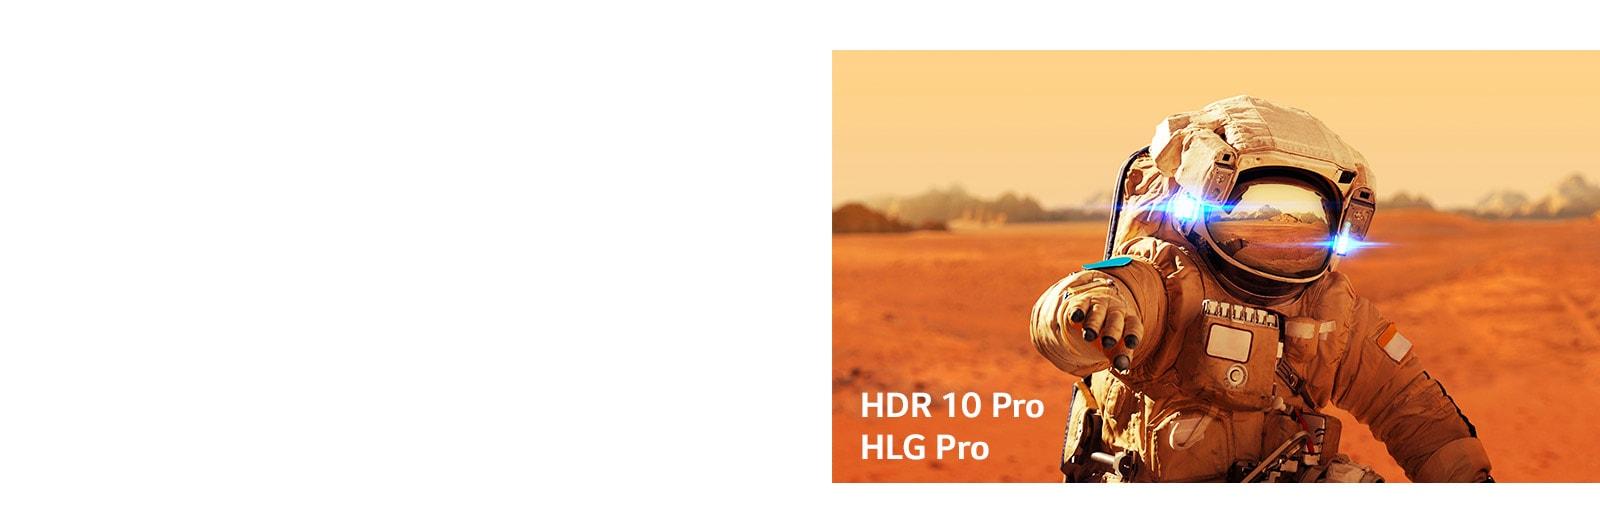 Marvel – Iron Man, titulní karty slogy HLG Pro aHDR 10 Pro